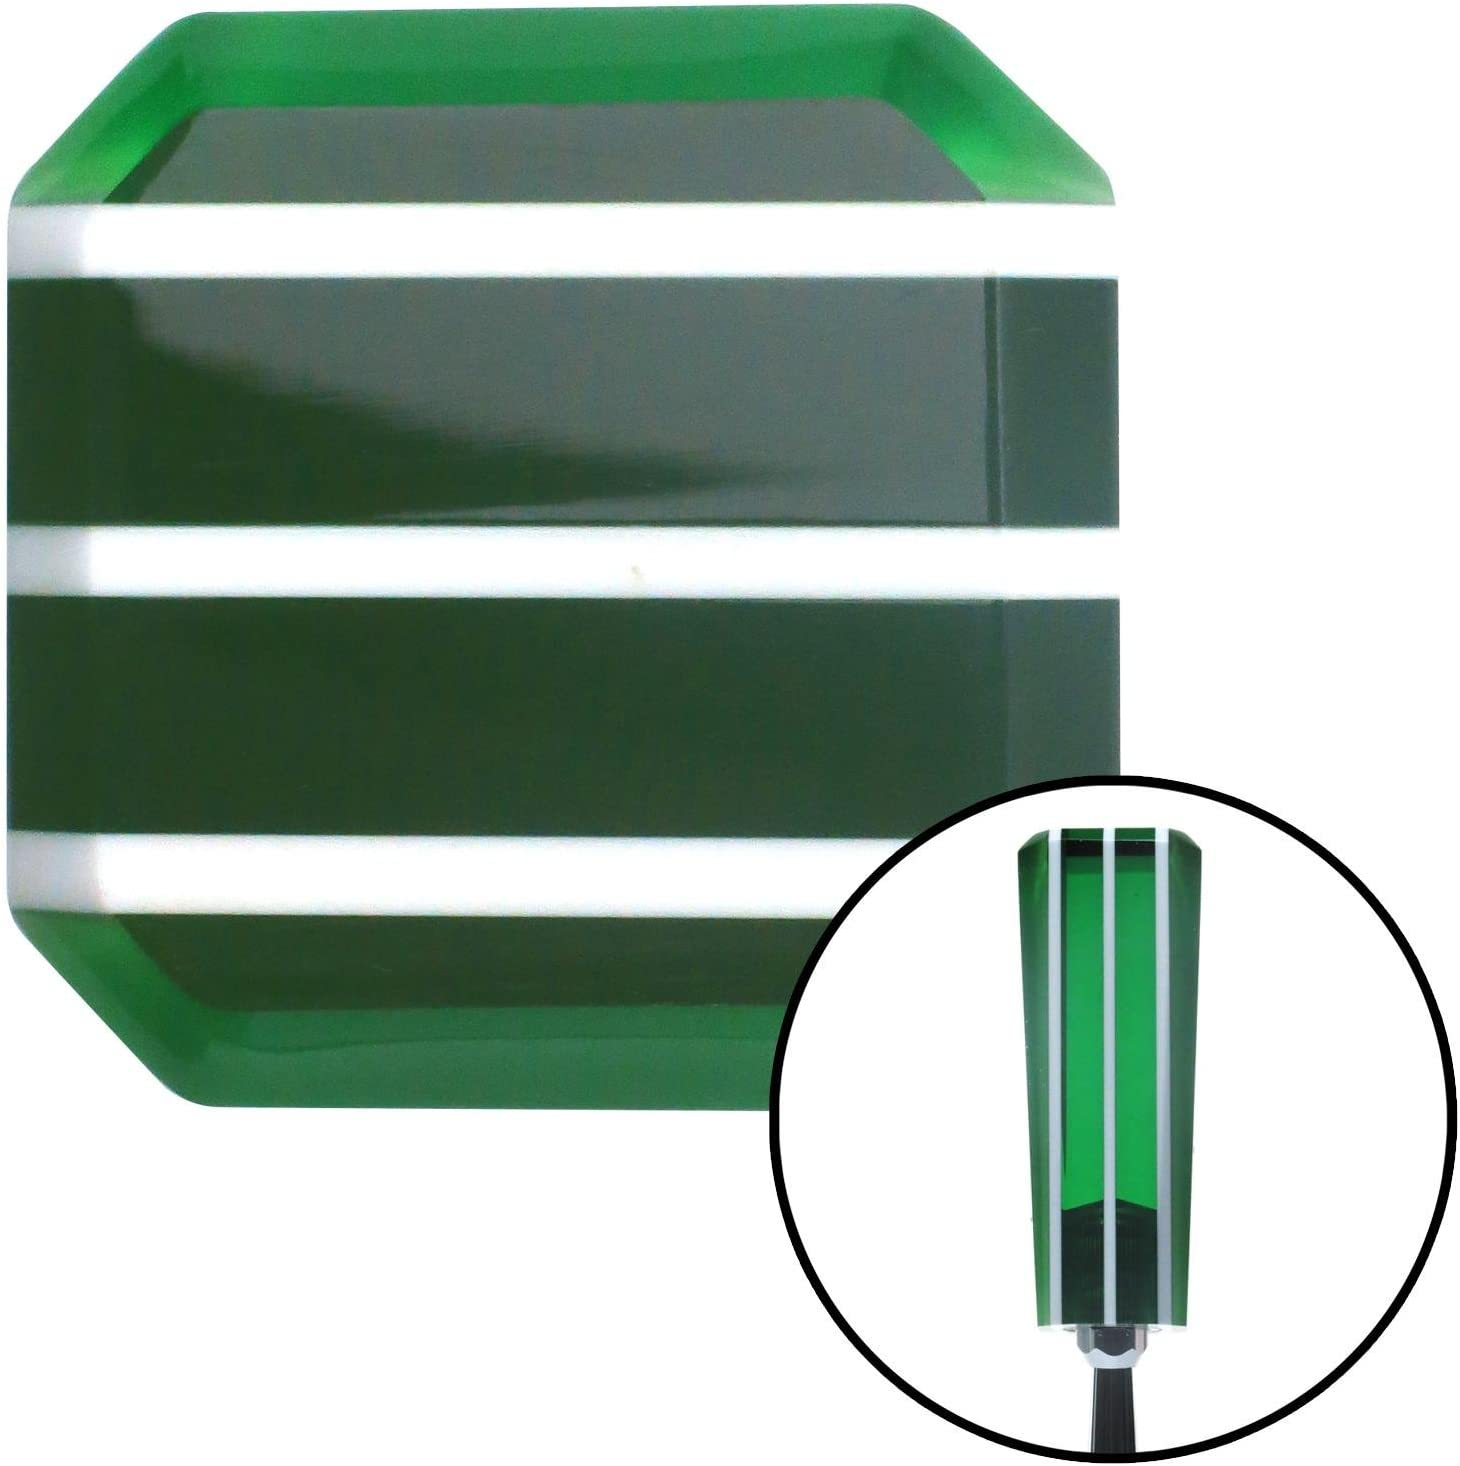 American Shifter 141873 Green Stripe Stix Shift Knob with M10 x 1.5 Insert